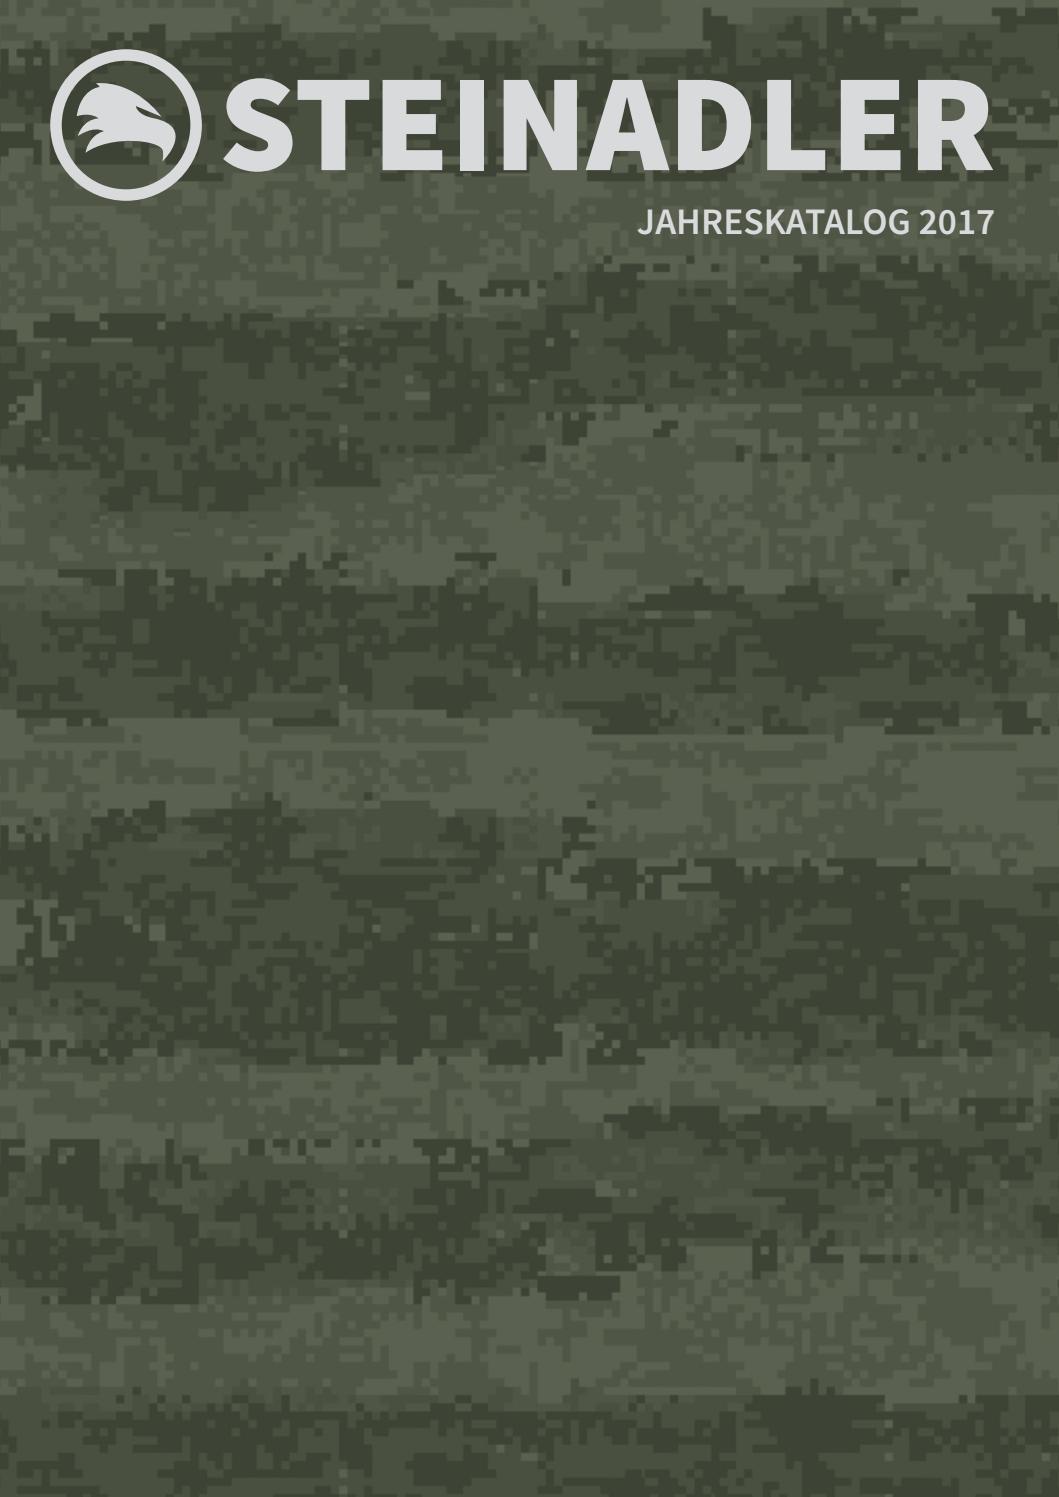 STEINADLER Jahreskatalog 2017 by STEINADLER HandelsgmbH issuu